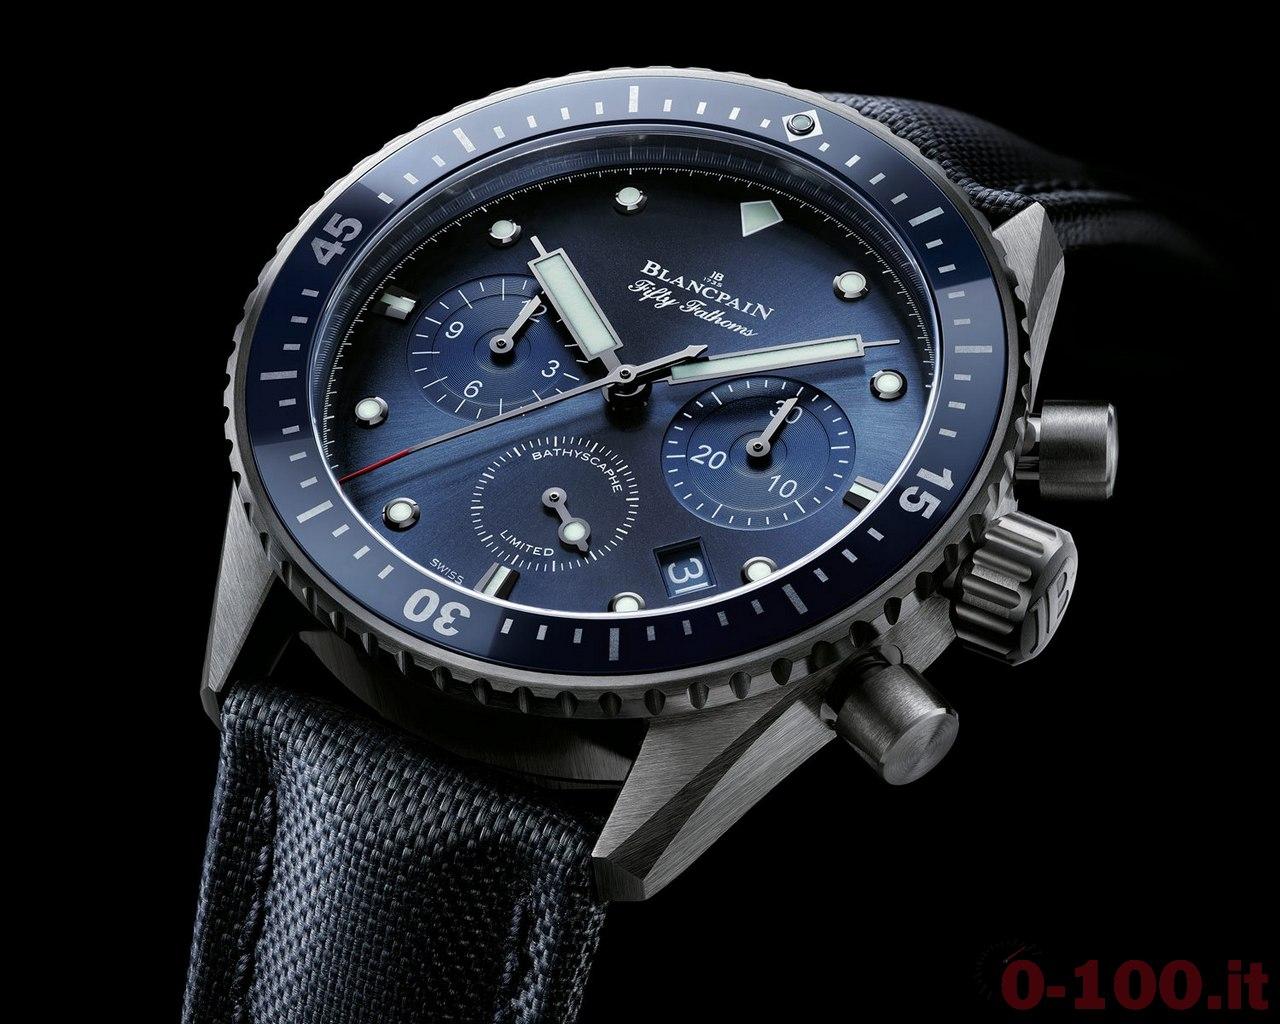 blancpain-ocean-commitment-chronographe-bathyscaphe-flyback-ref-5200-0240-052a-0-100_4